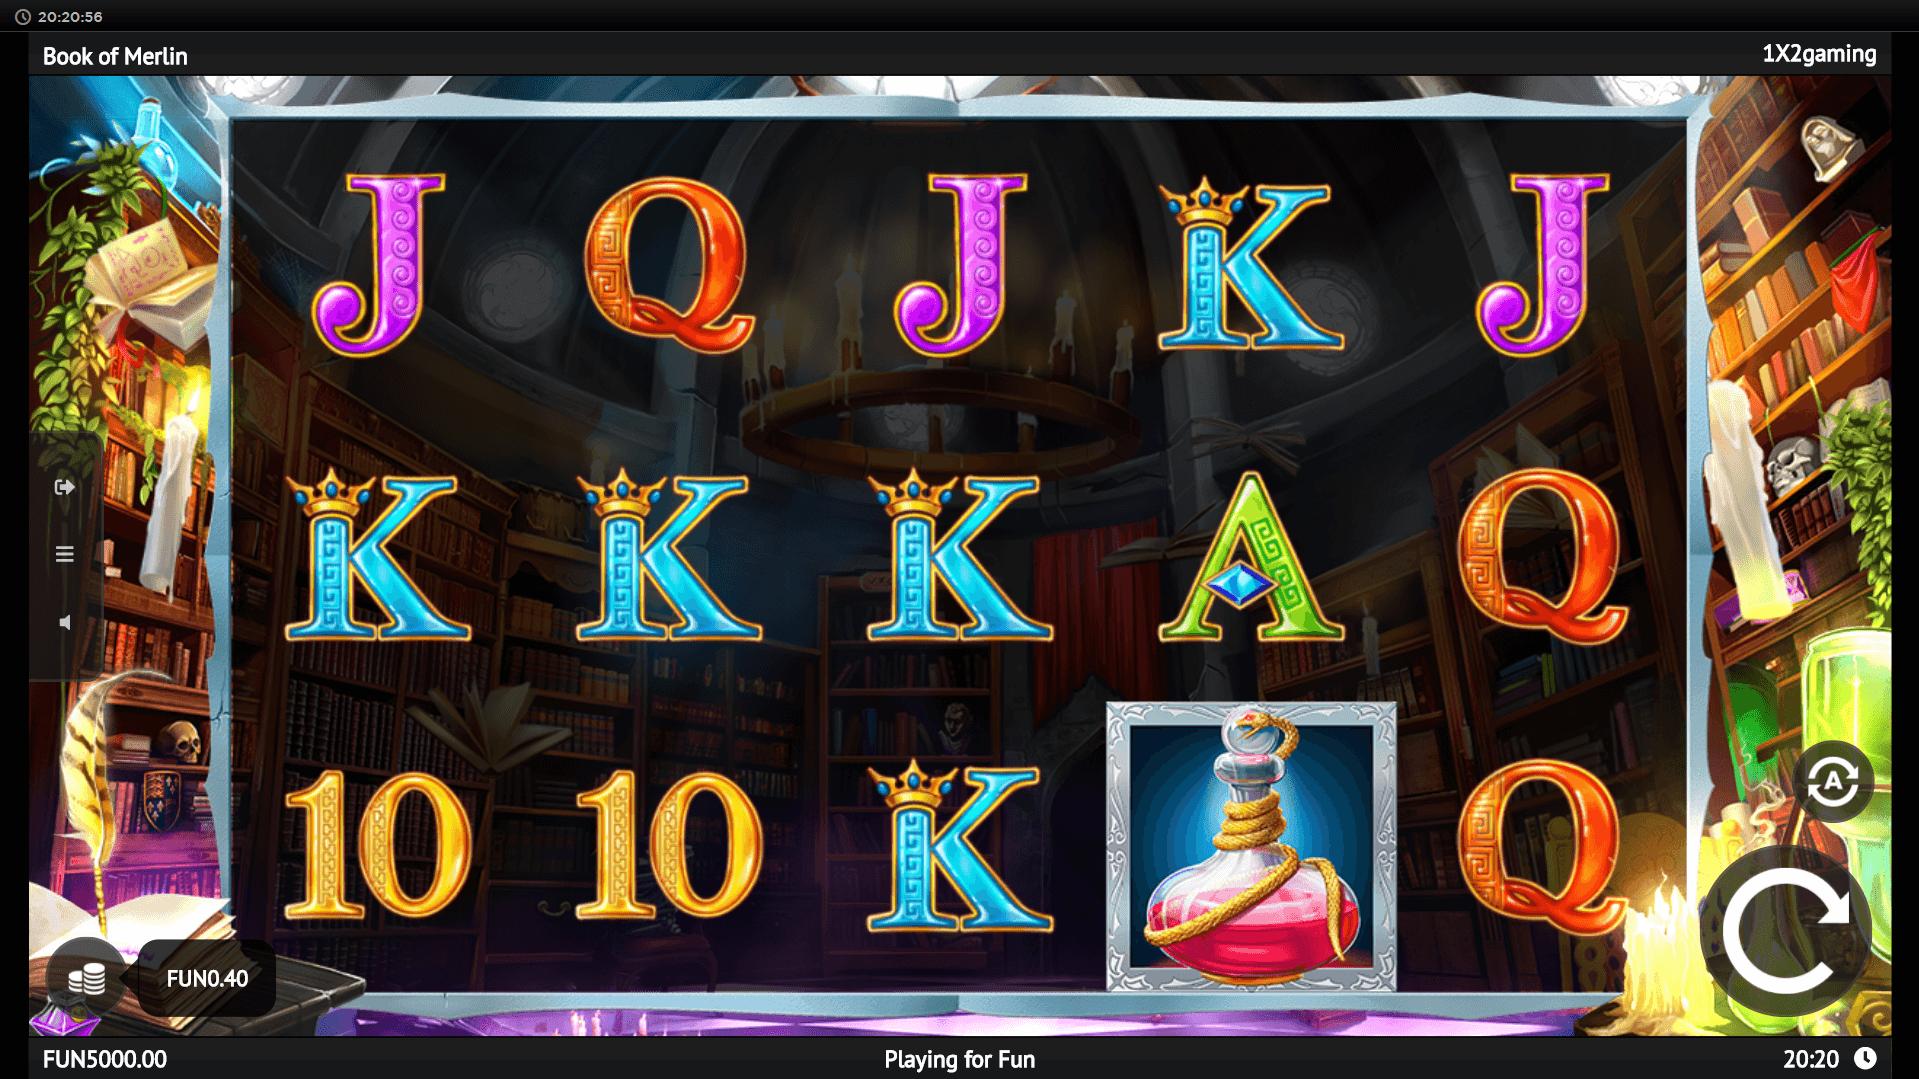 Book Of Merlin slot machine screenshot